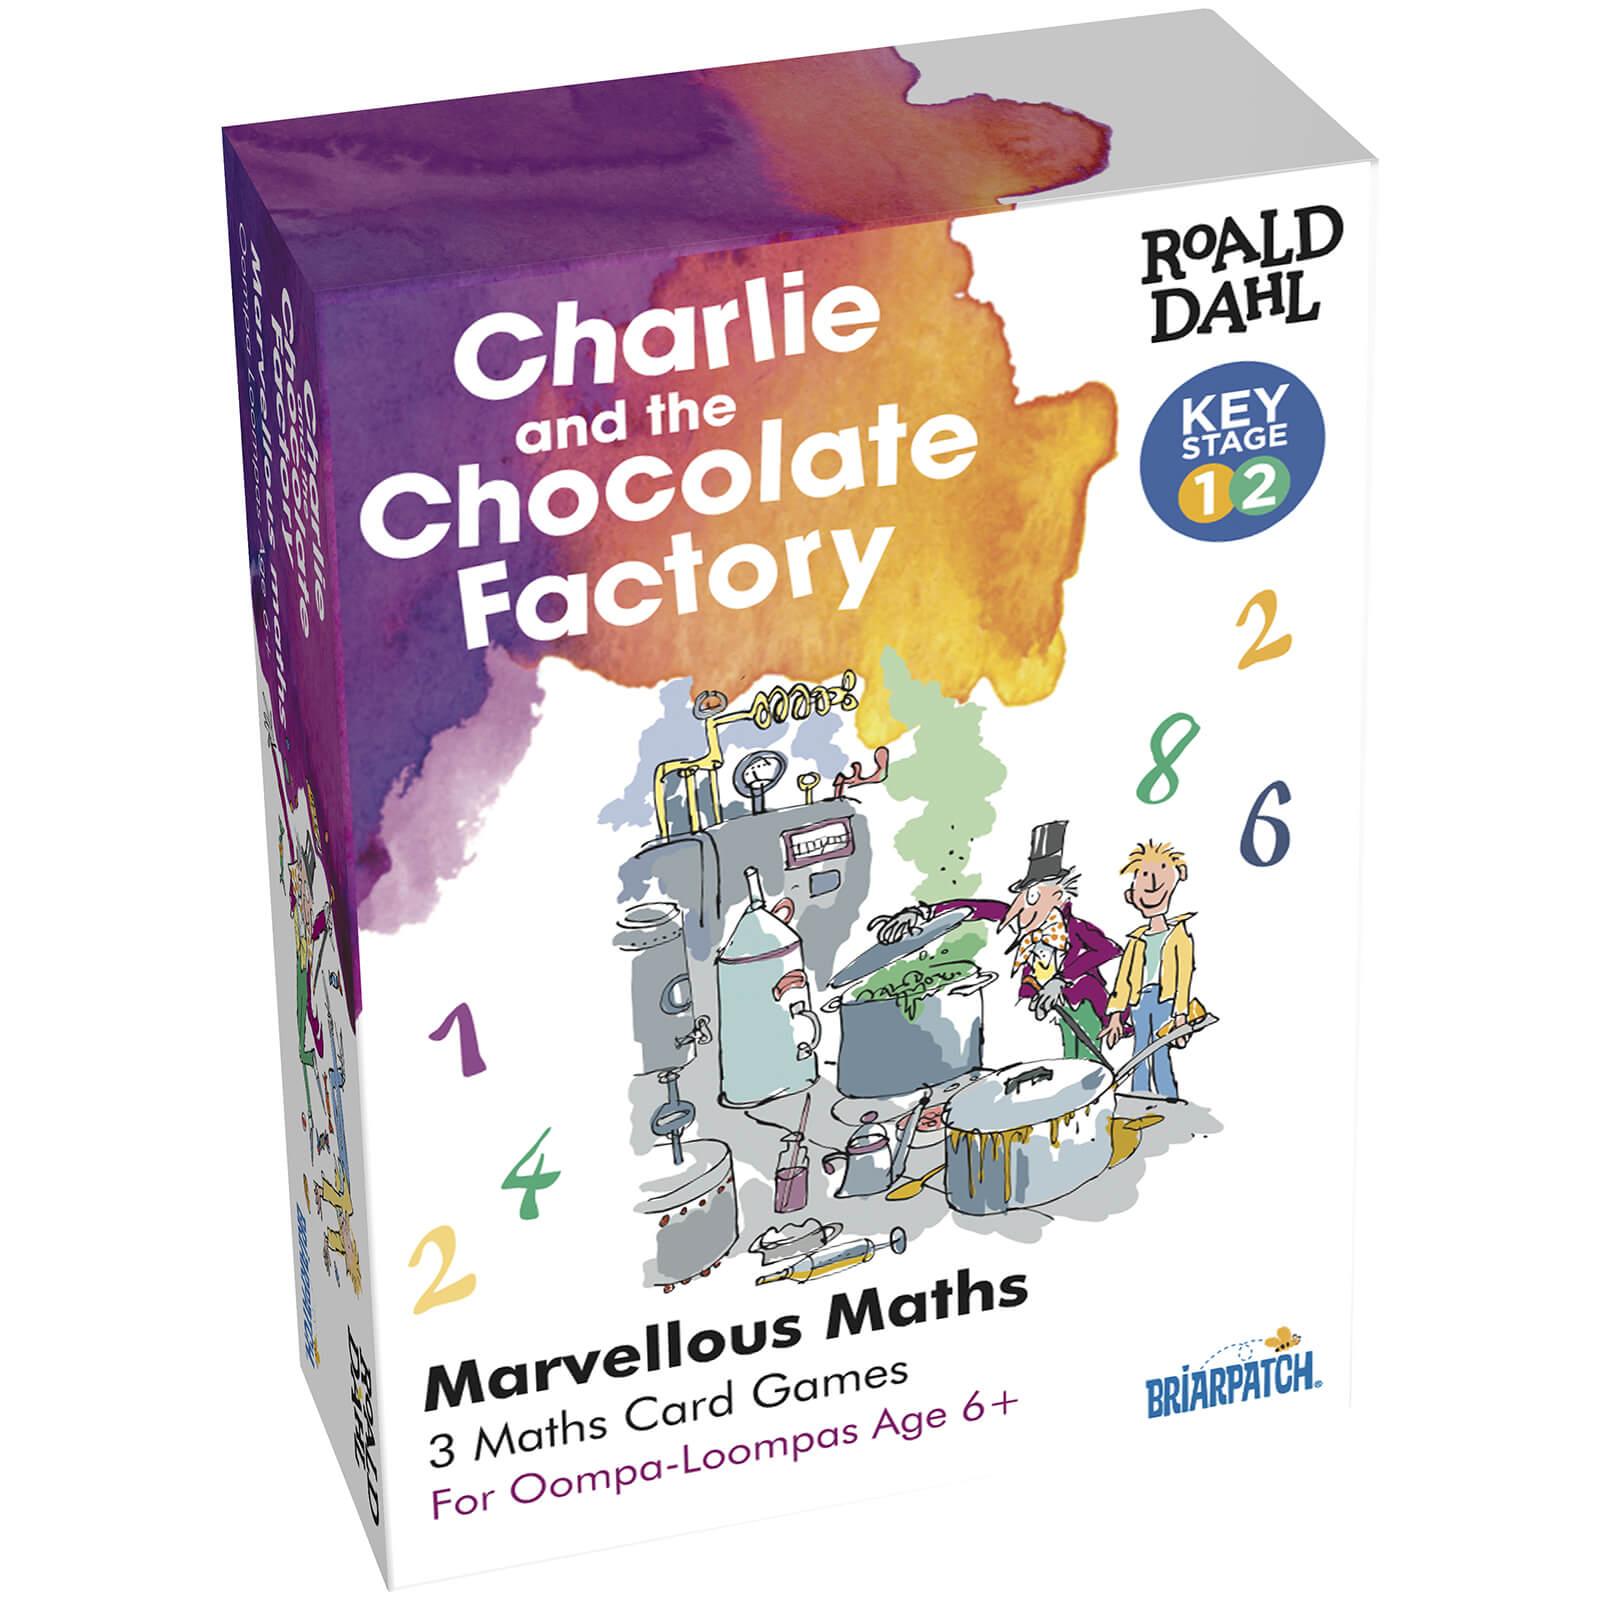 Image of Roald Dahl Charlie Maths Educational Games